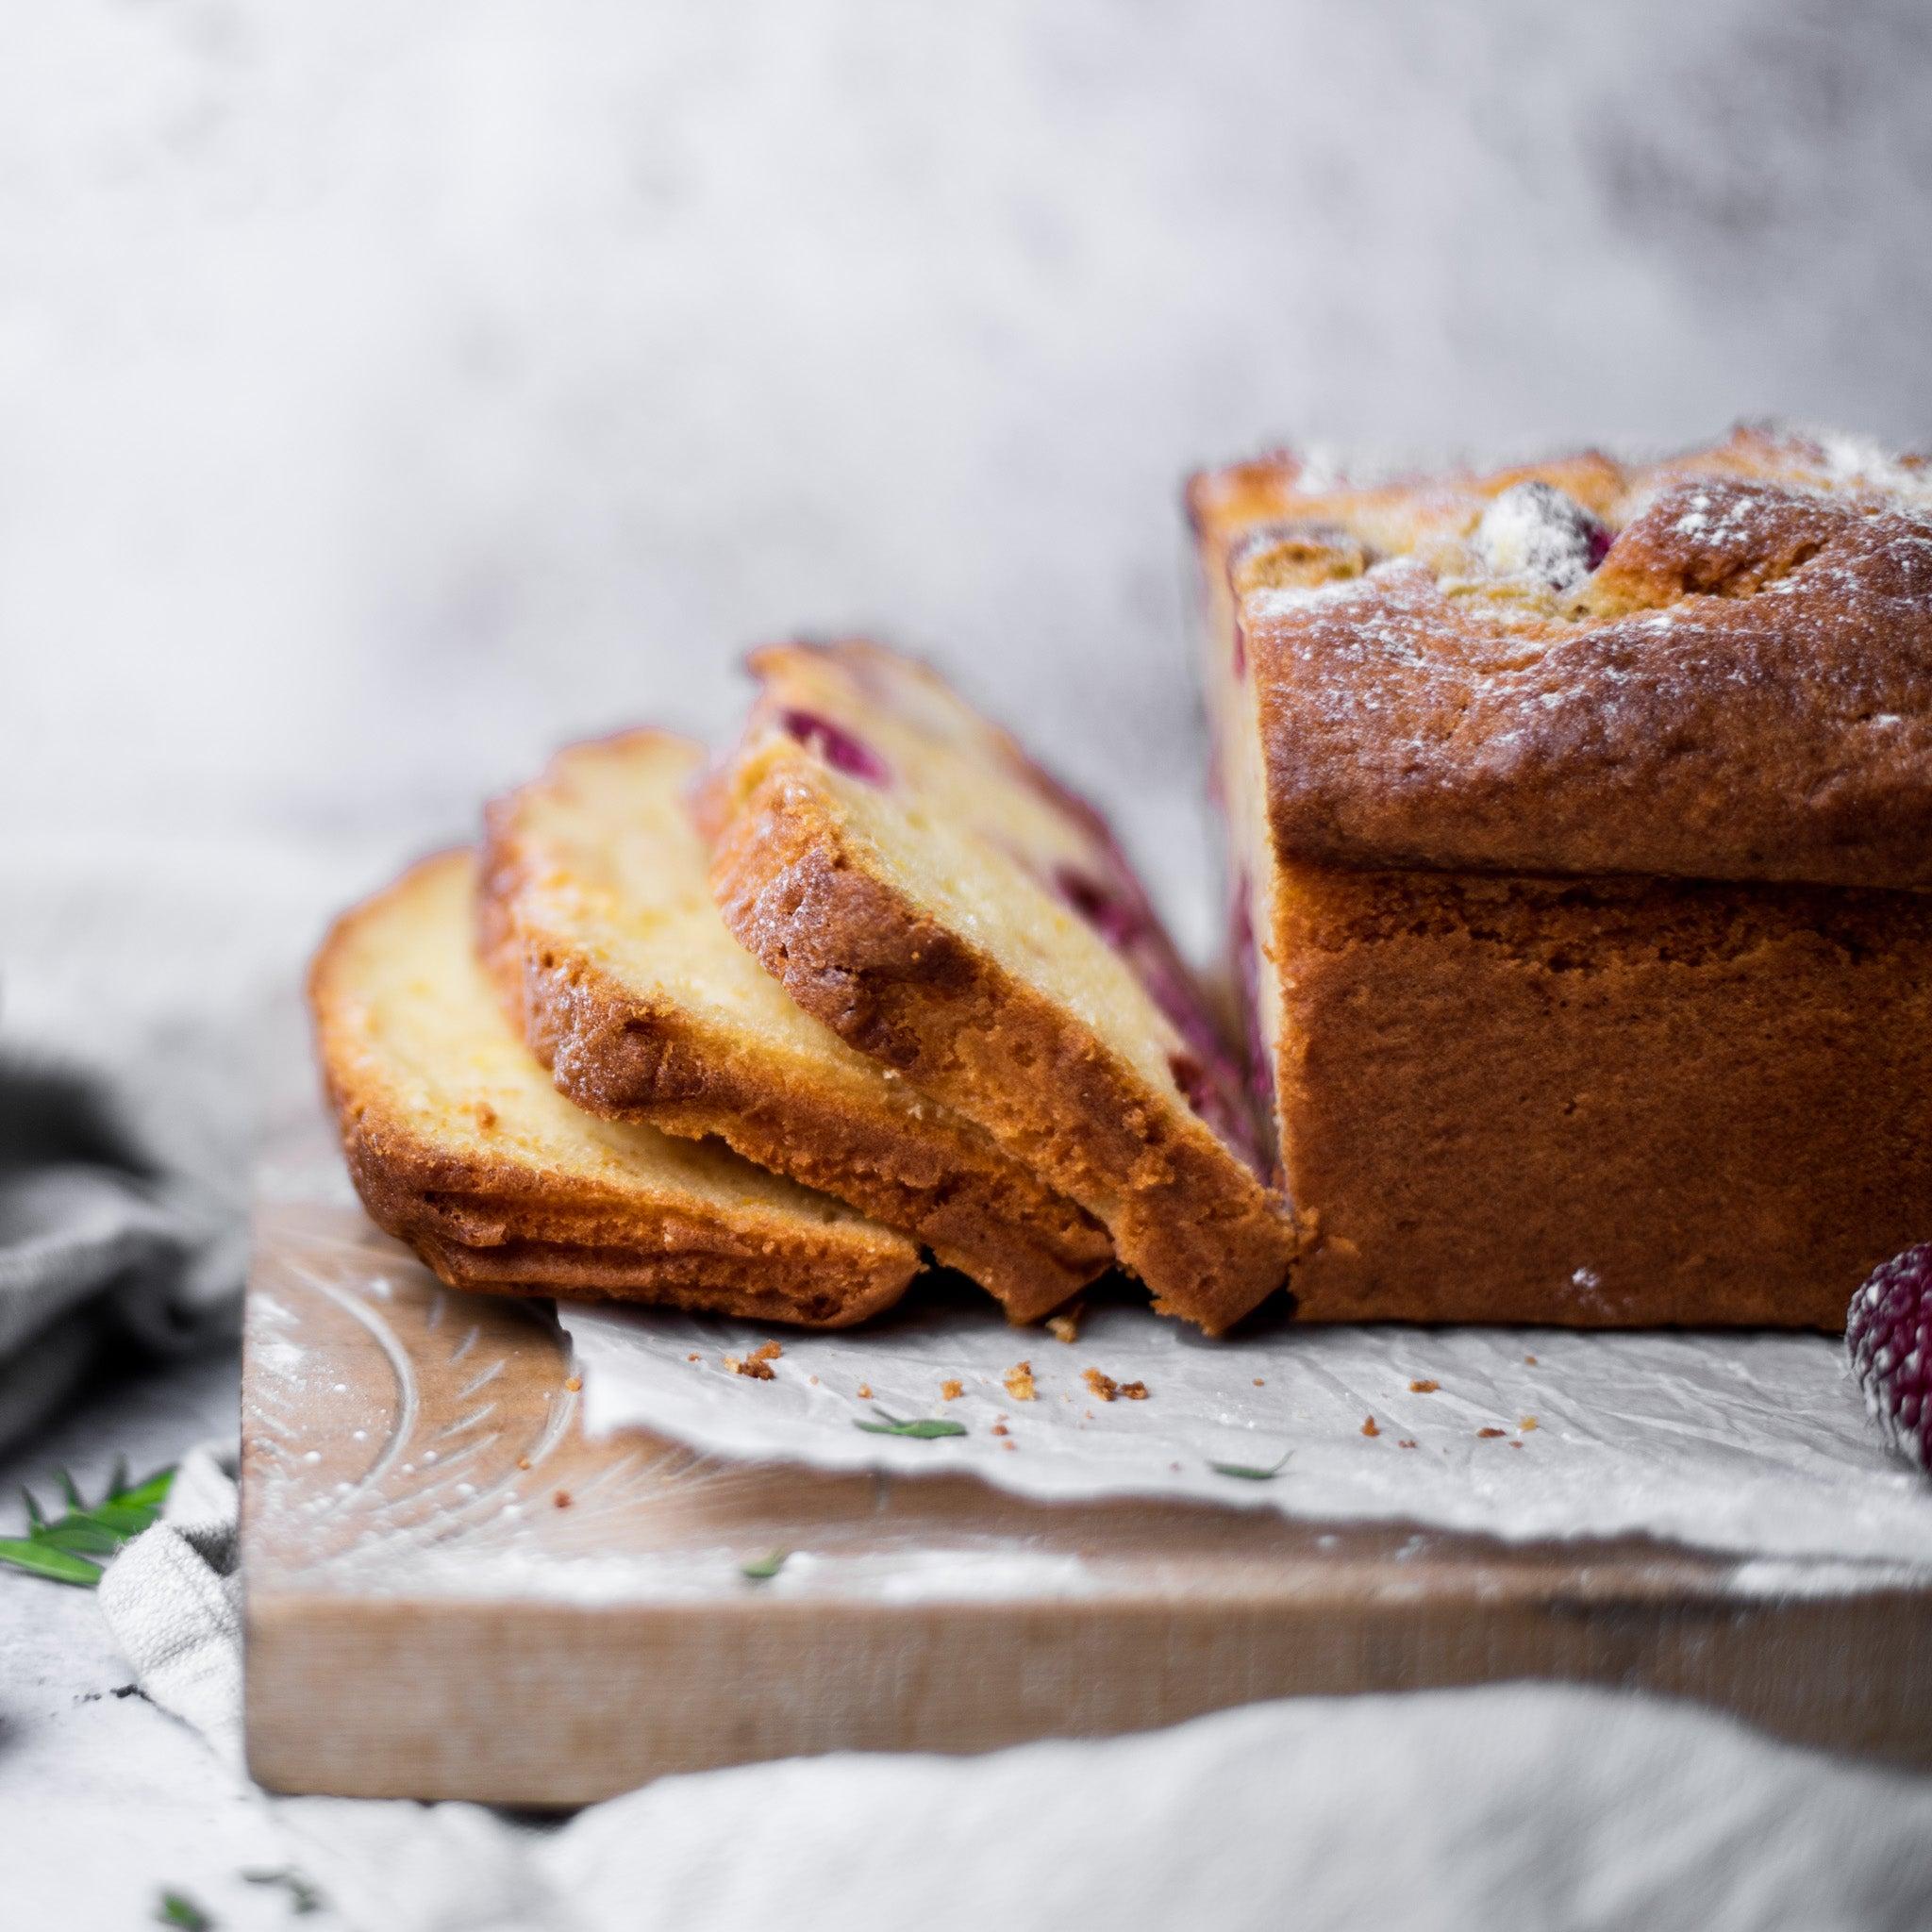 Allinsons-Orange-Raspberry-Loaf-Cake-1-1-Baking-Mad-5.jpg